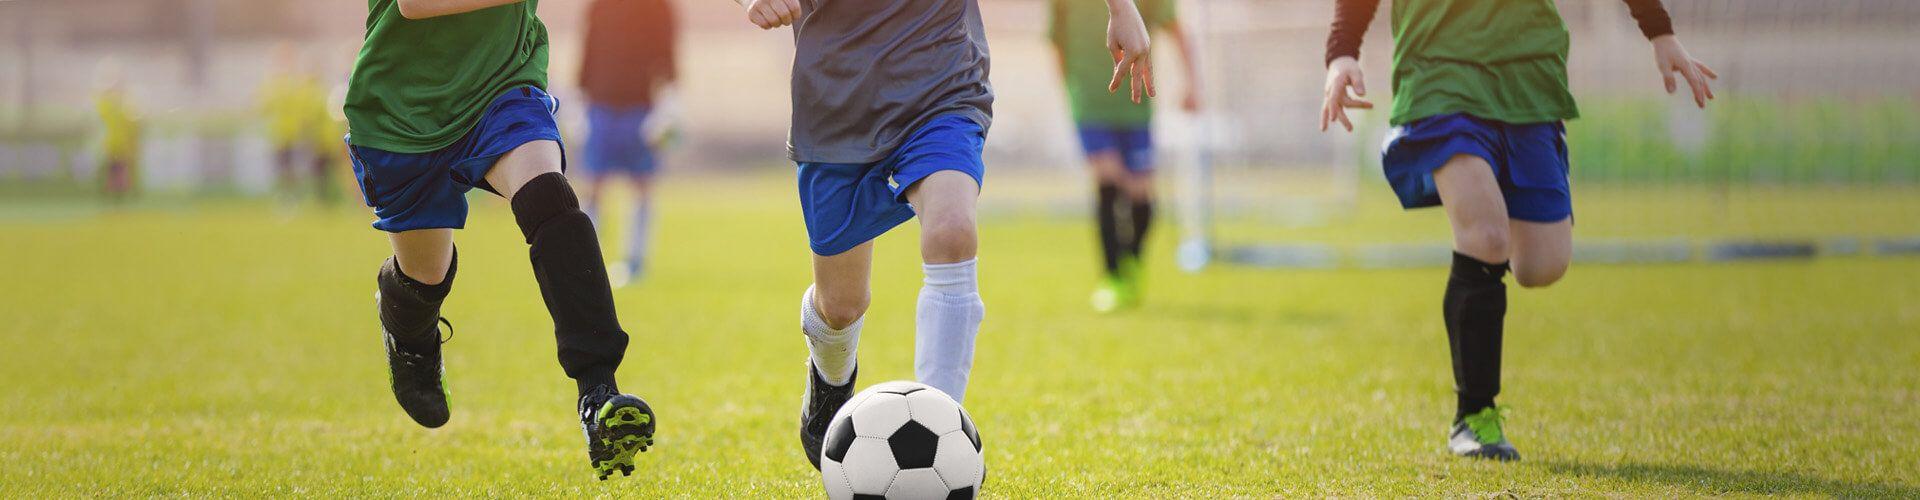 Escuela de Fútbol C.A. Montemar